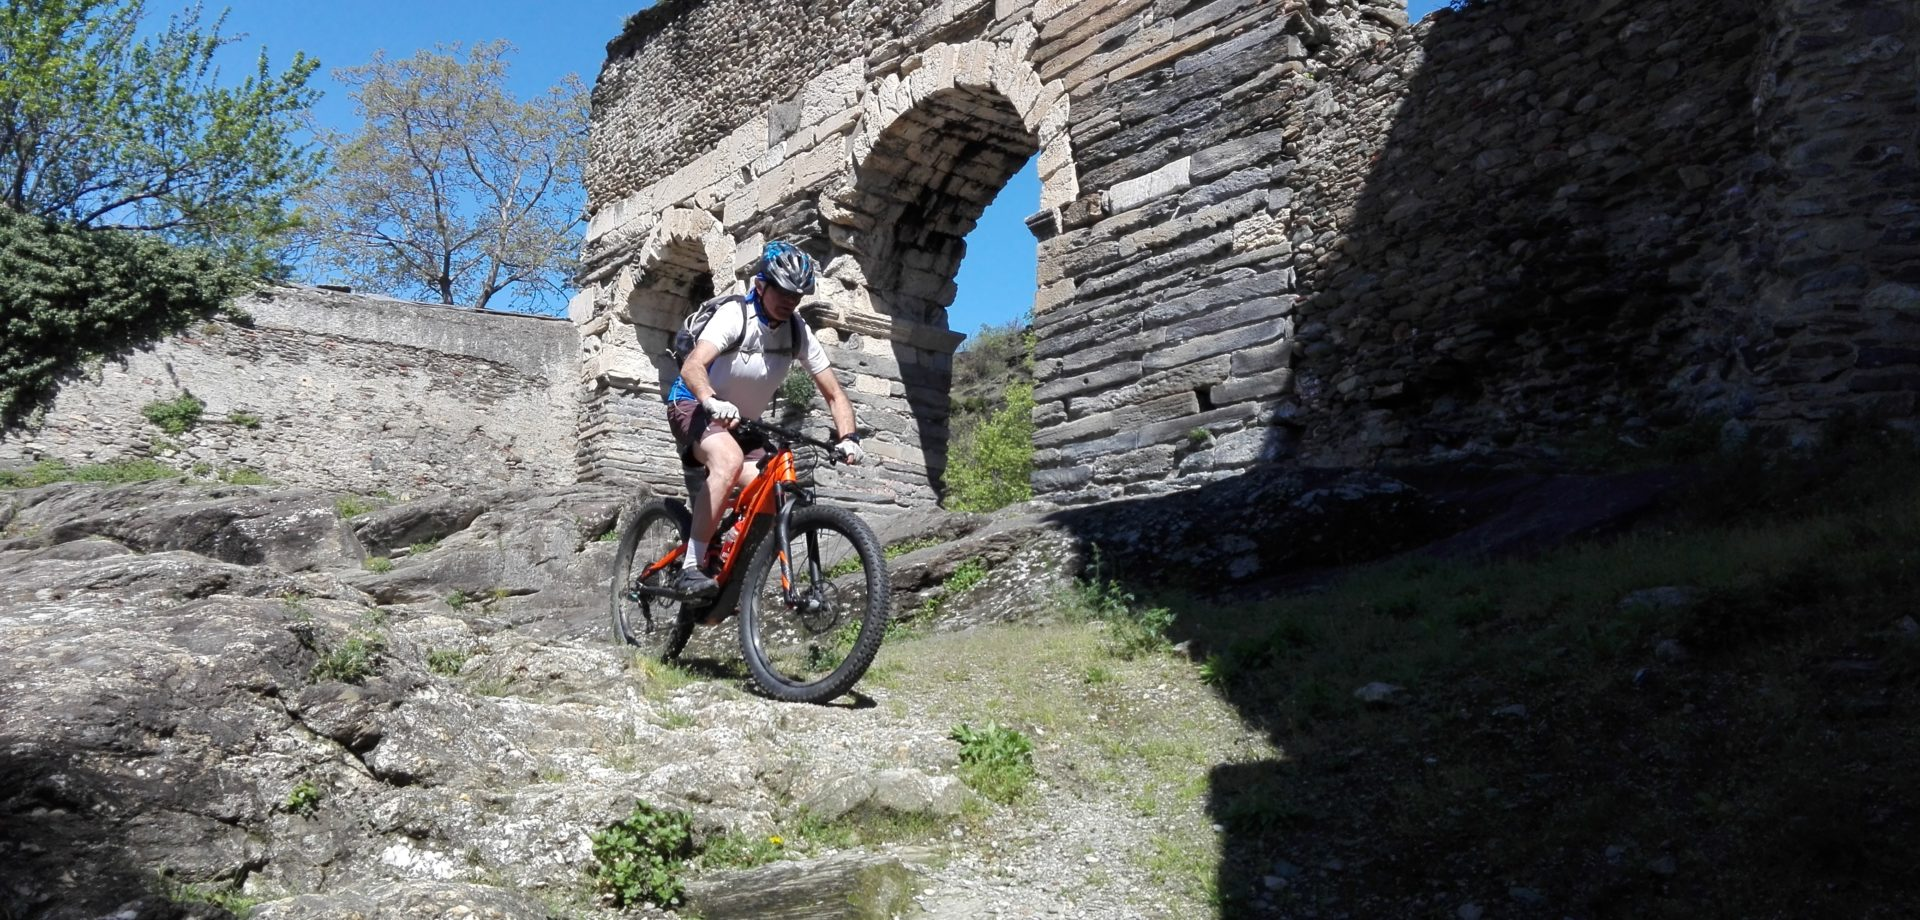 e-biketour.net